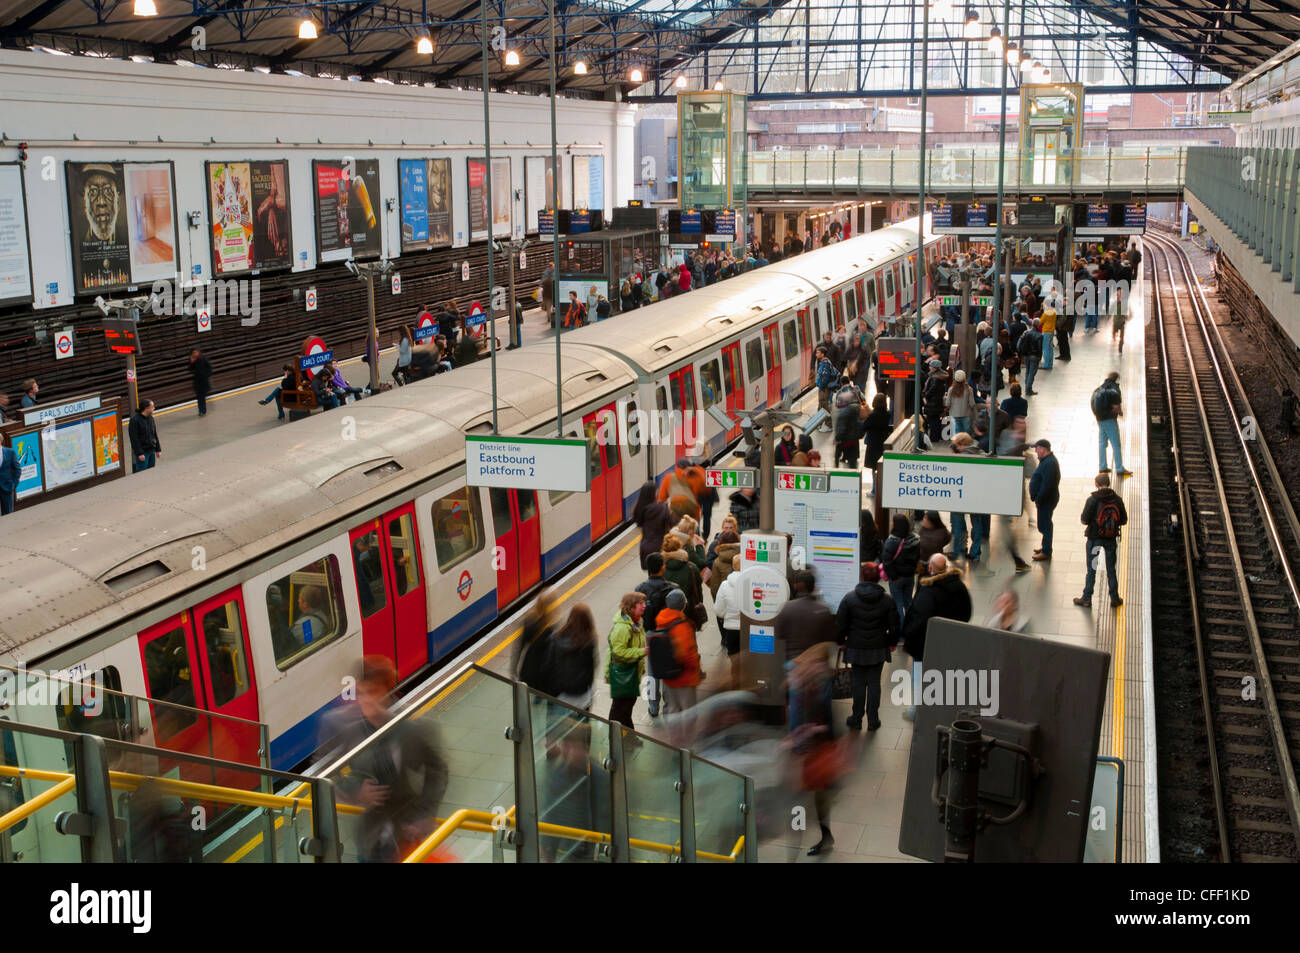 District Line platforms, Earls Court Underground Station, London, England, United Kingdom, Europe - Stock Image